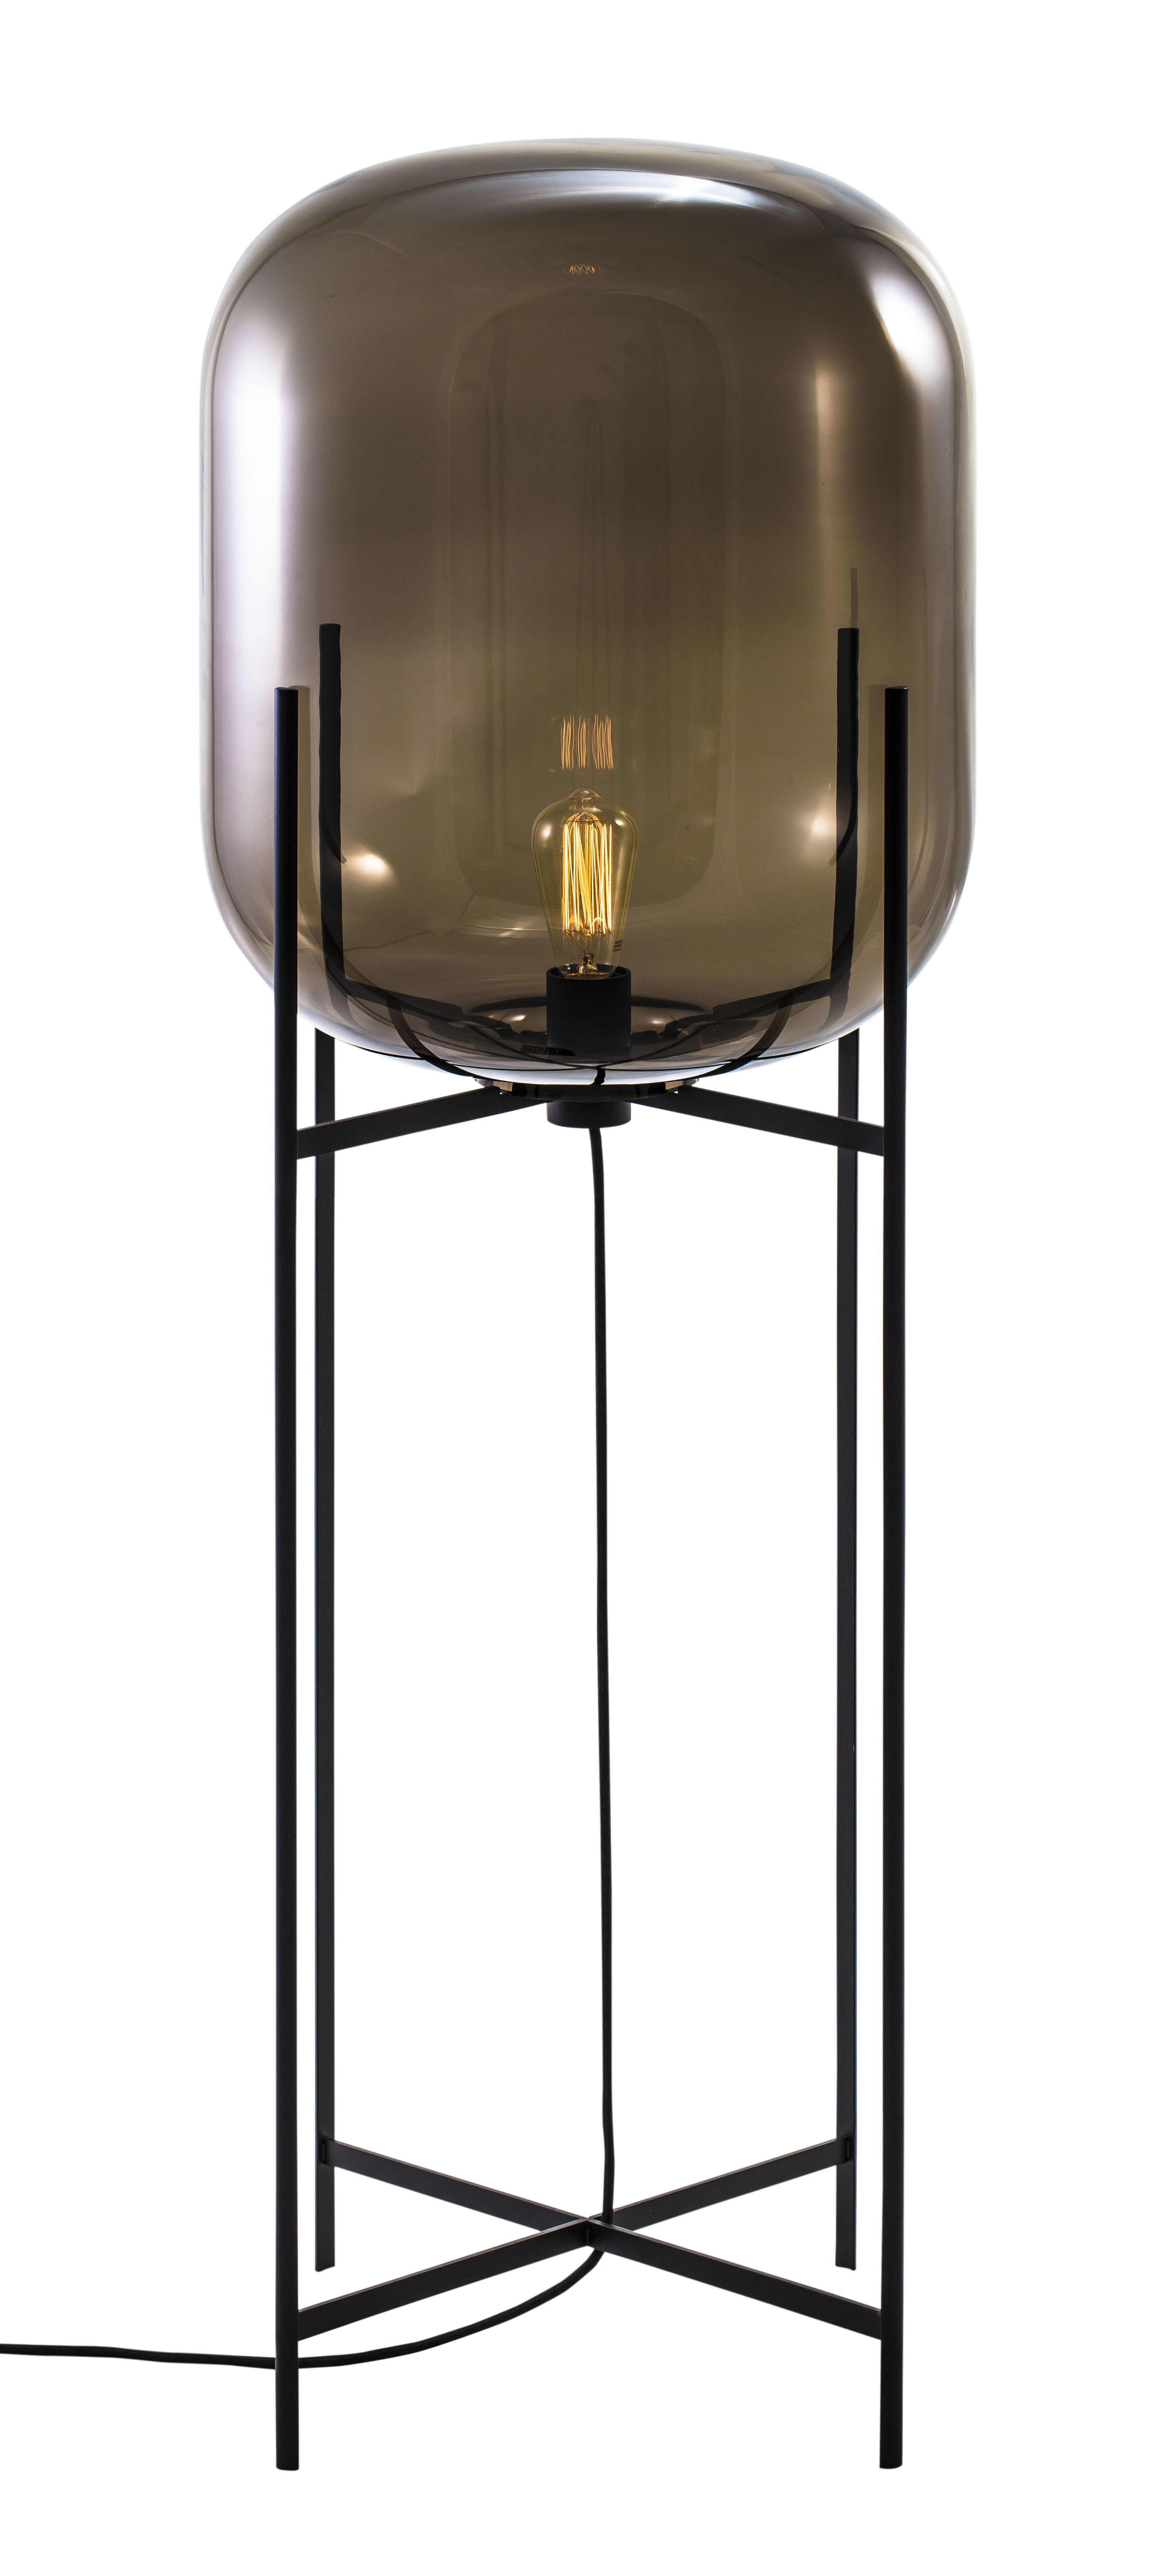 Floor Lamp Oda Big By Sebastian Herkner For Pulpo Materials Colors Smoky Grey Glass Black Powder Coated Floor Lamp Lighting Lamp Table Lamp Lighting